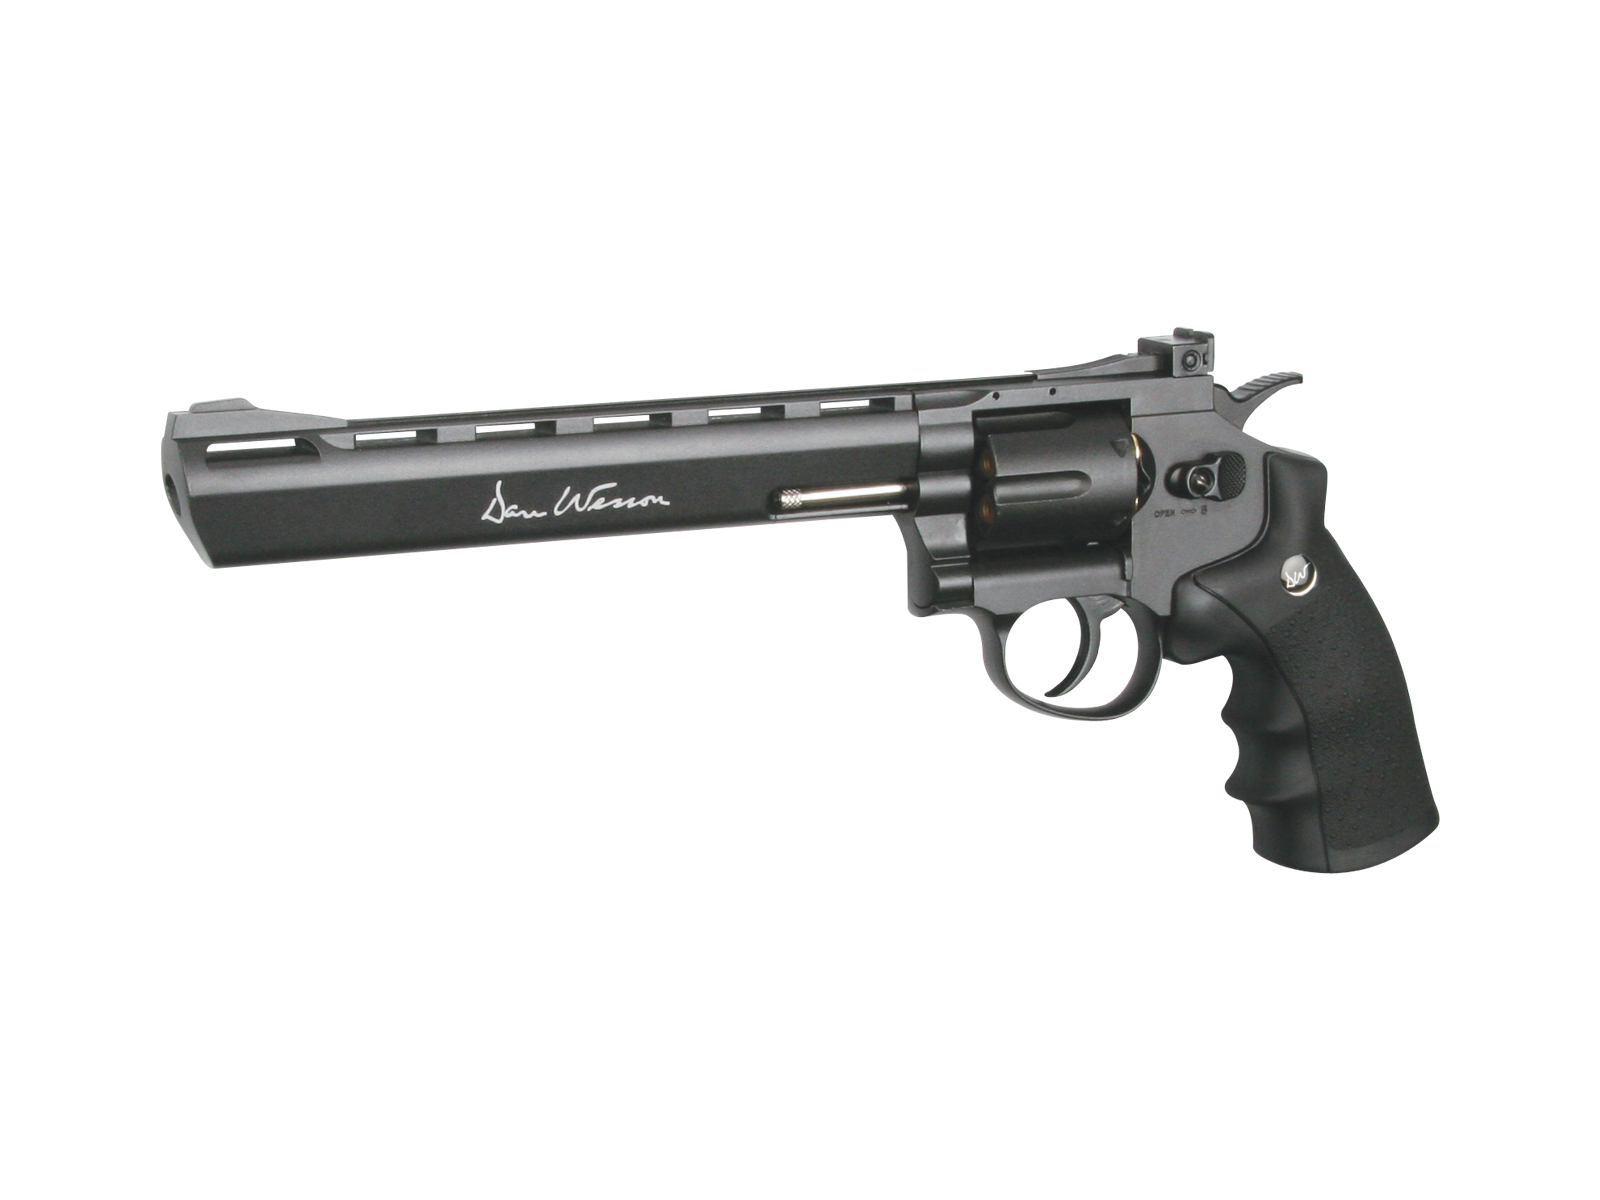 ASG Dan Wesson 8inch револьвер пневматический CO2, 4,5 мм, цвет: Grey (16183) цена